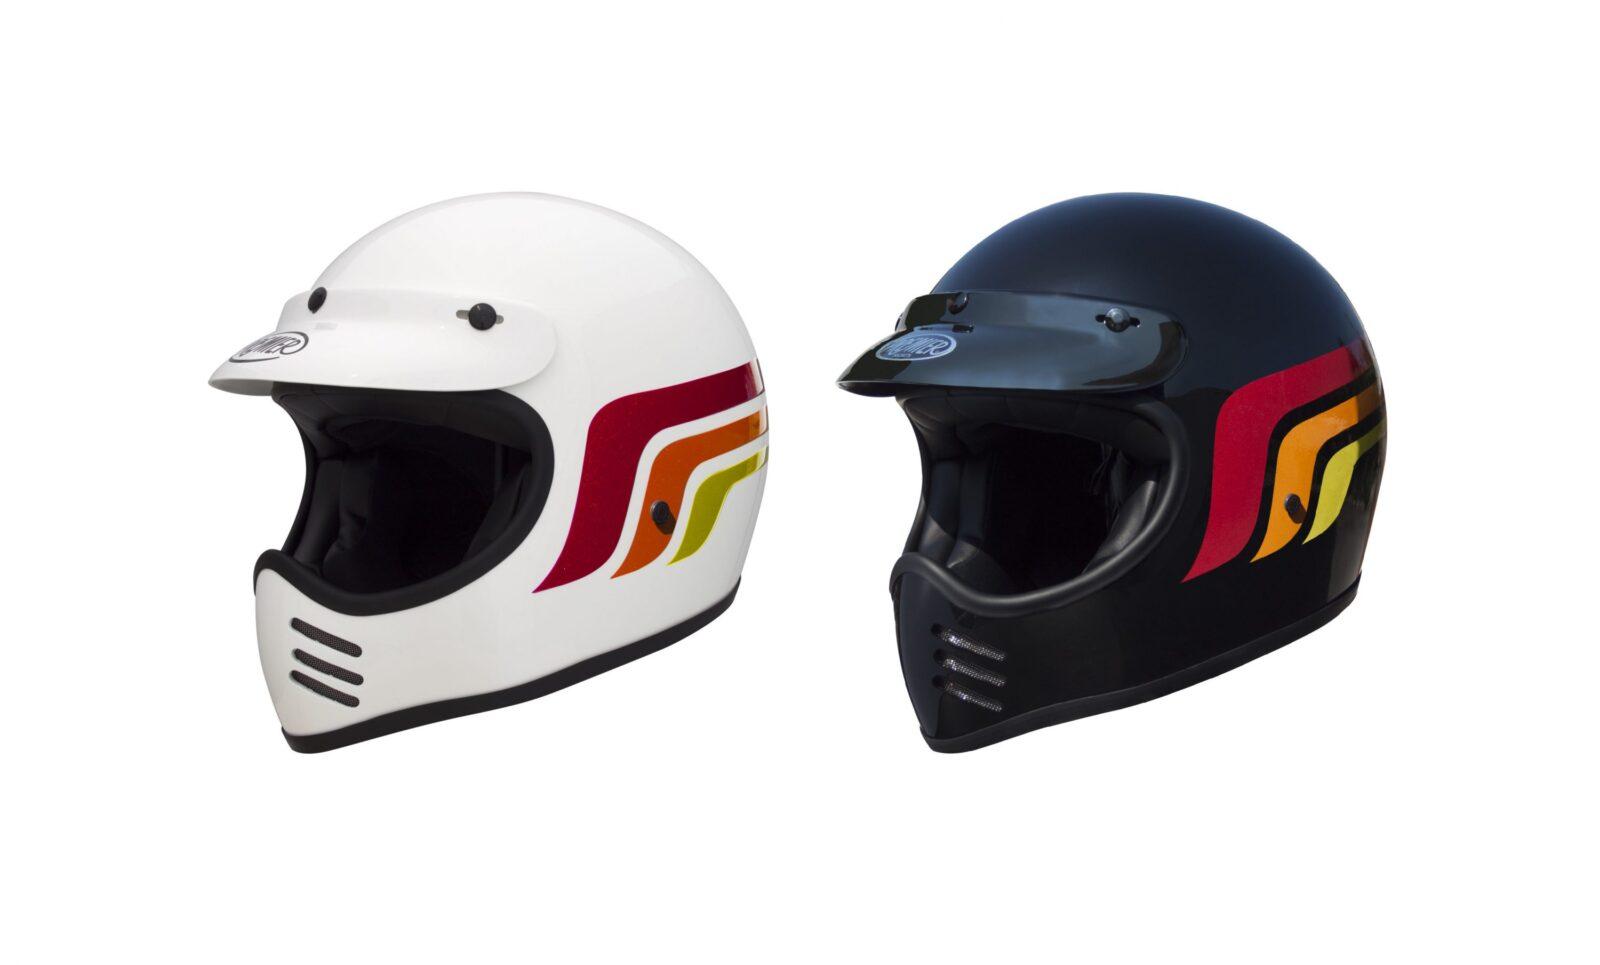 Premier MX LC 8 Helmet 2 1600x965 - Premier MX LC 8 Helmet